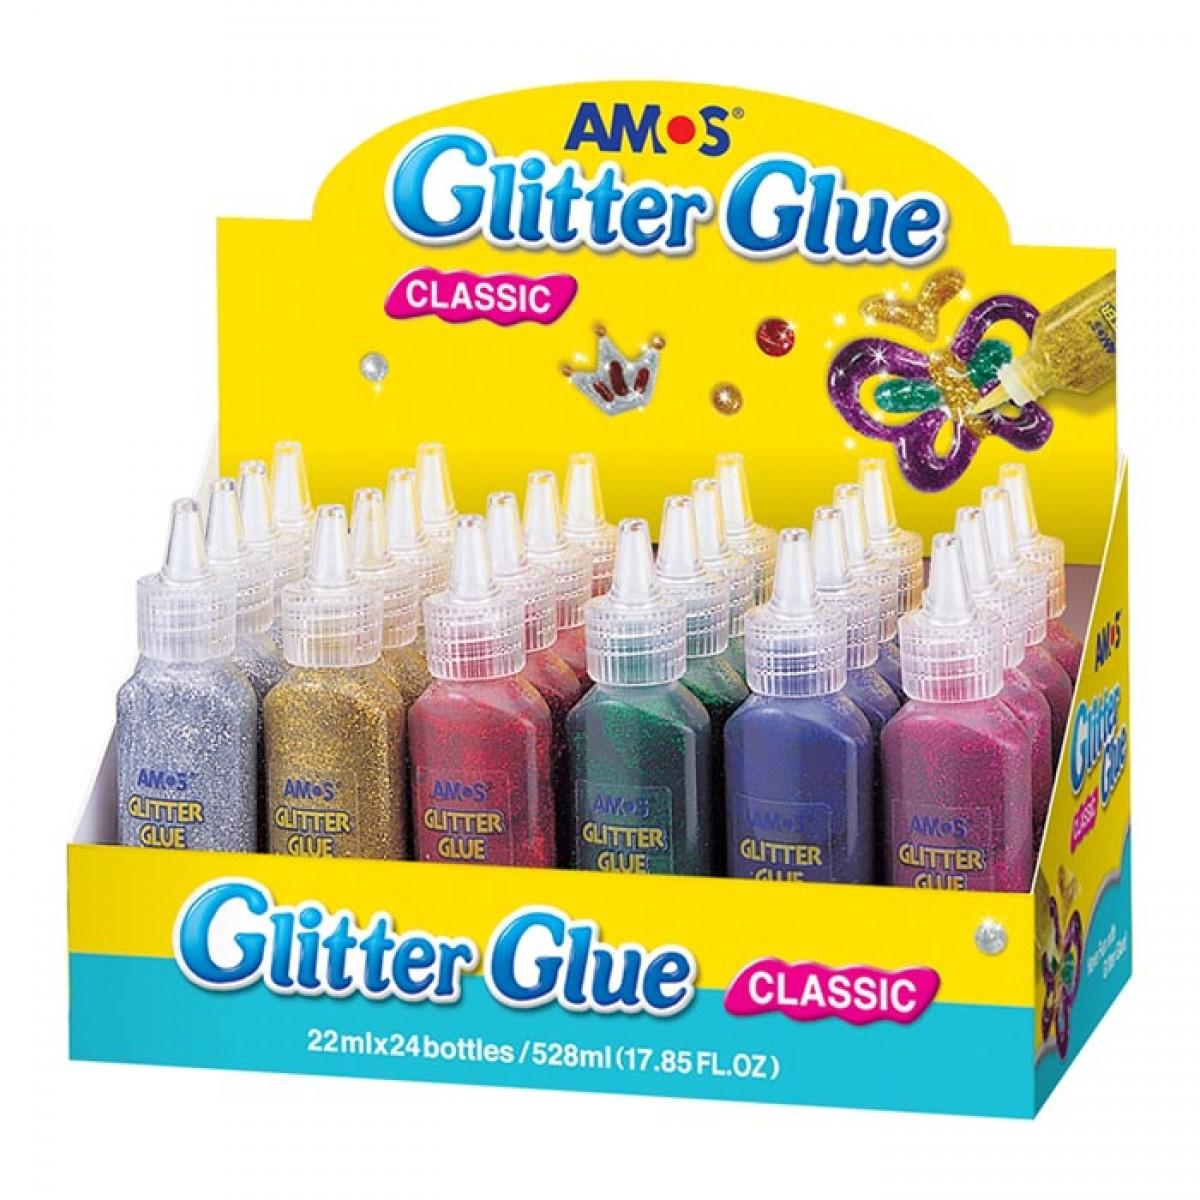 Amos Glitter Glue Χρυσόκολλα 22ml (1 Τεμ.) Είδη Ζωγραφικής